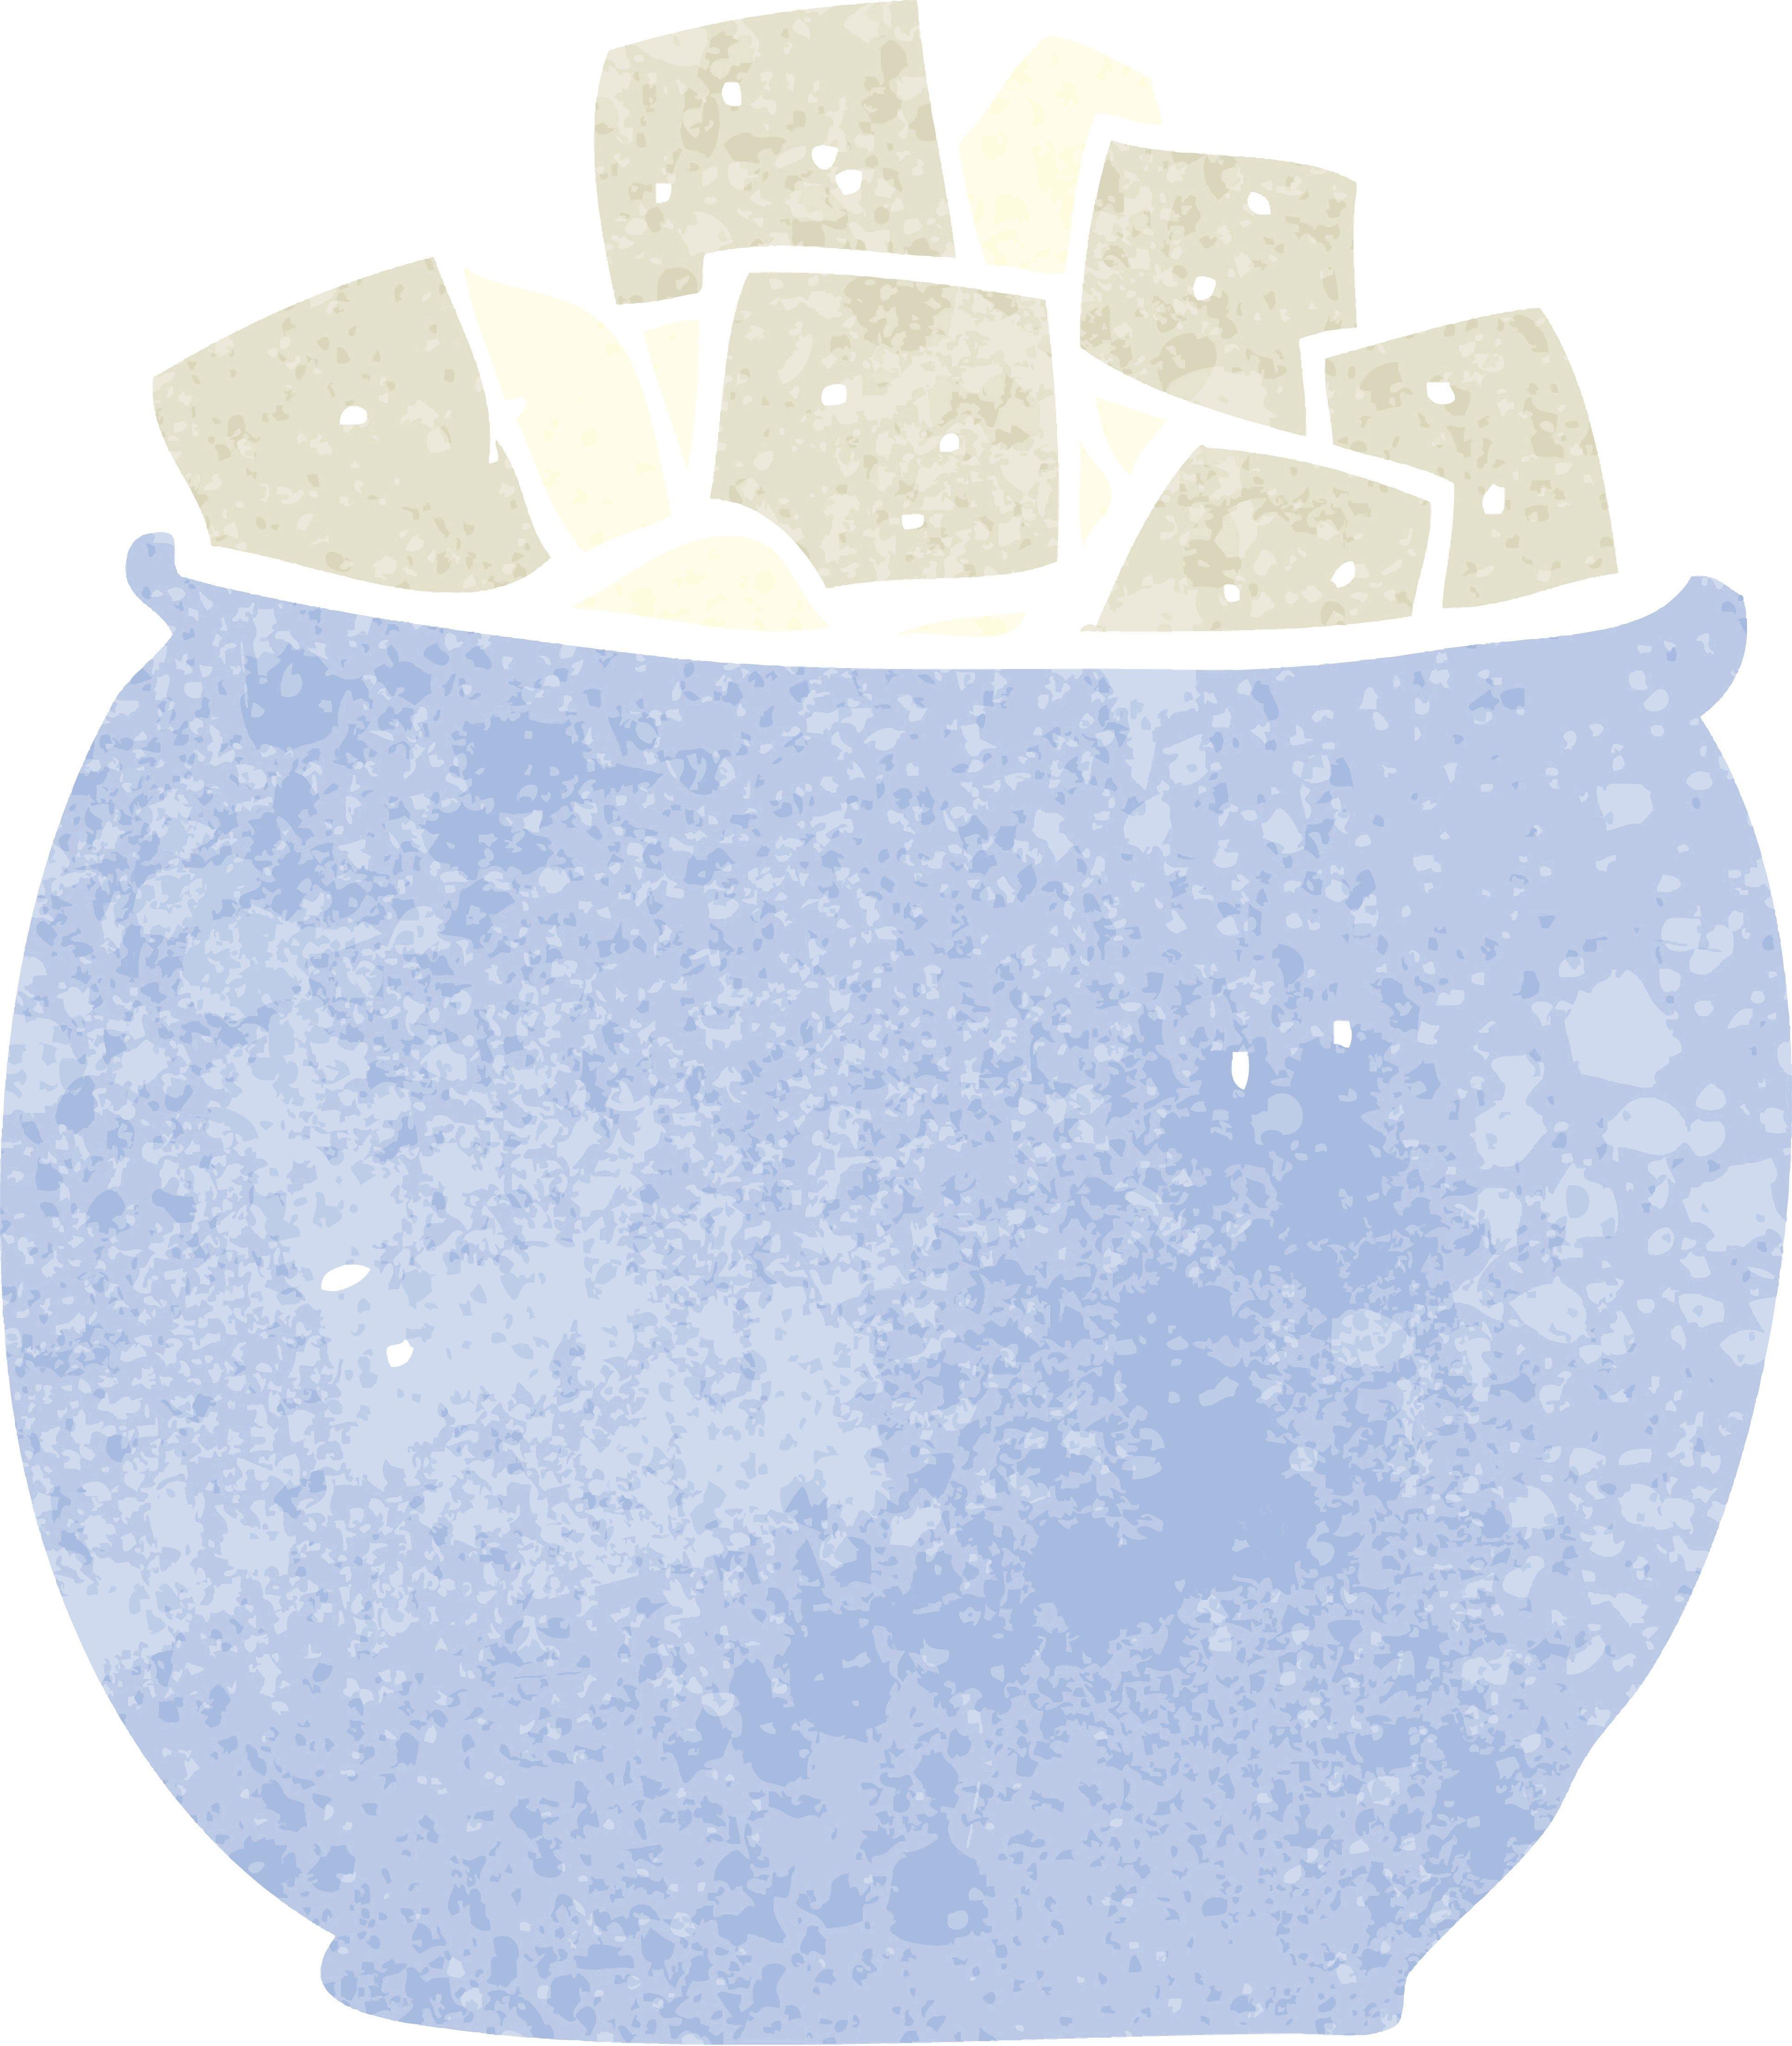 cartoon sugar cubes